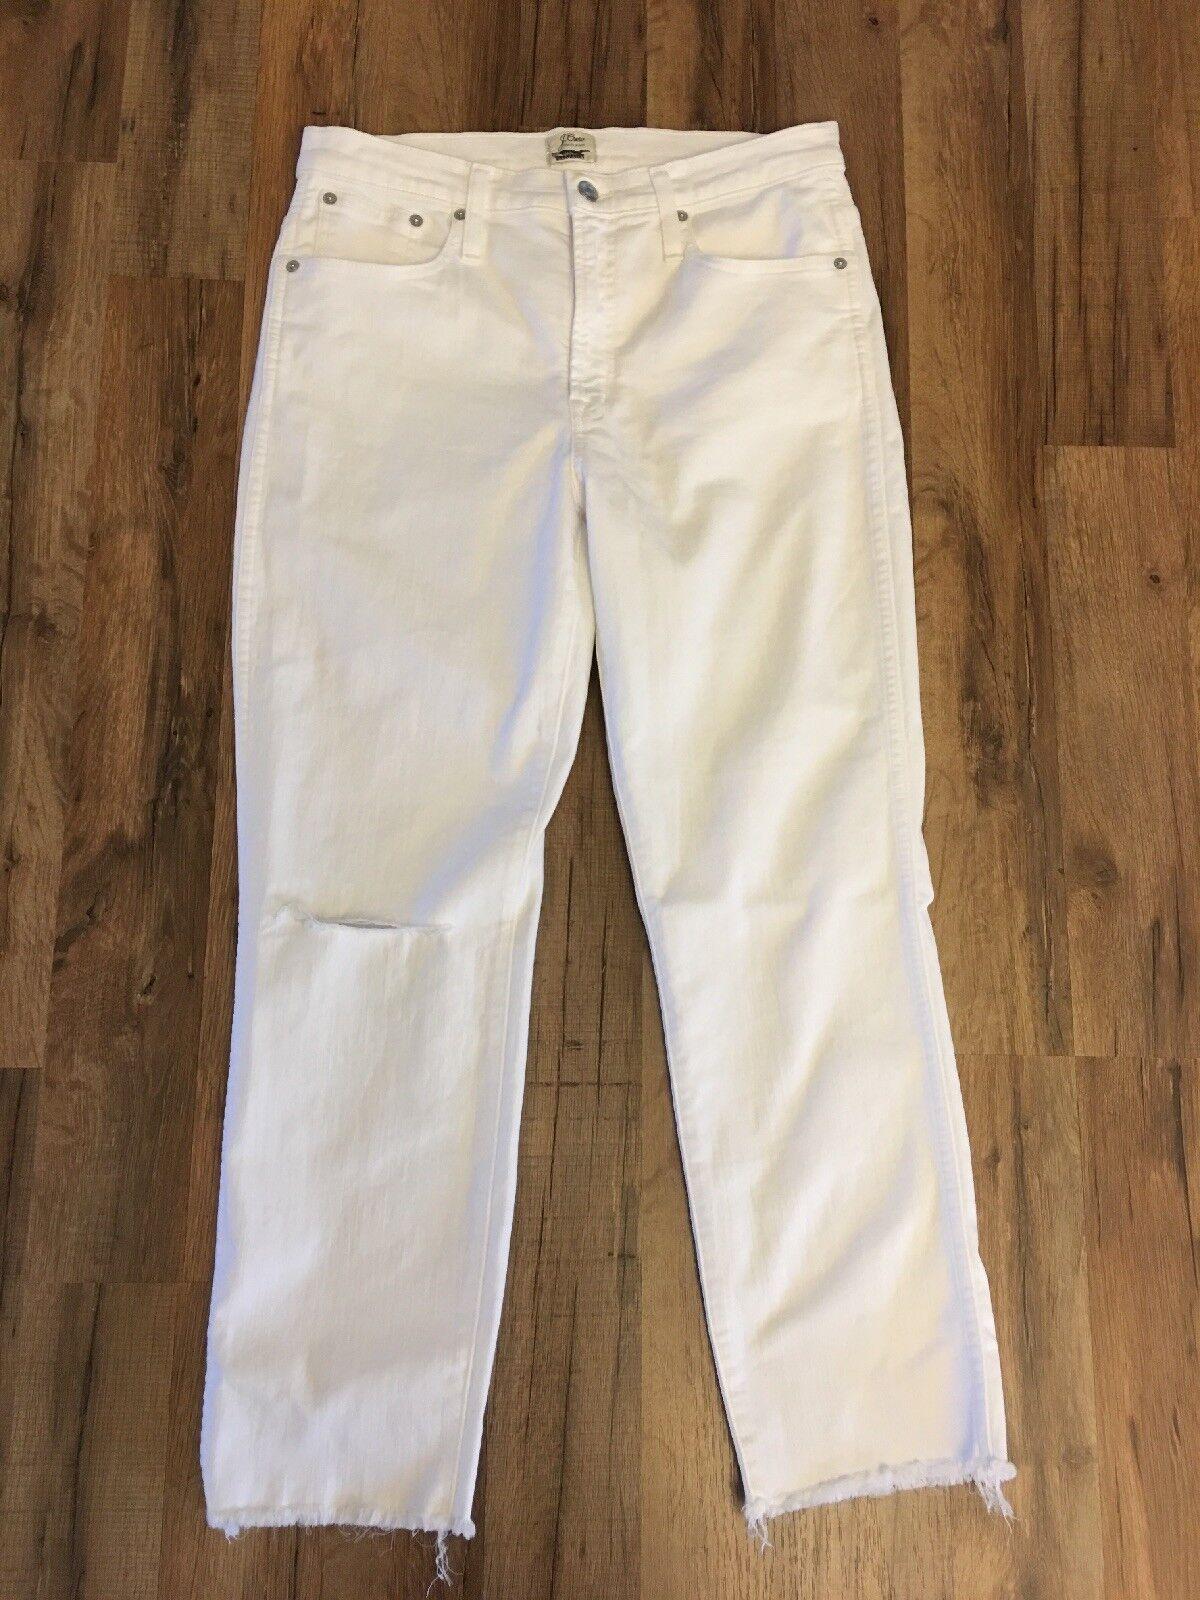 New J Crew Vintage Straight Jean in White with Raw Hems Sz 30 J2378